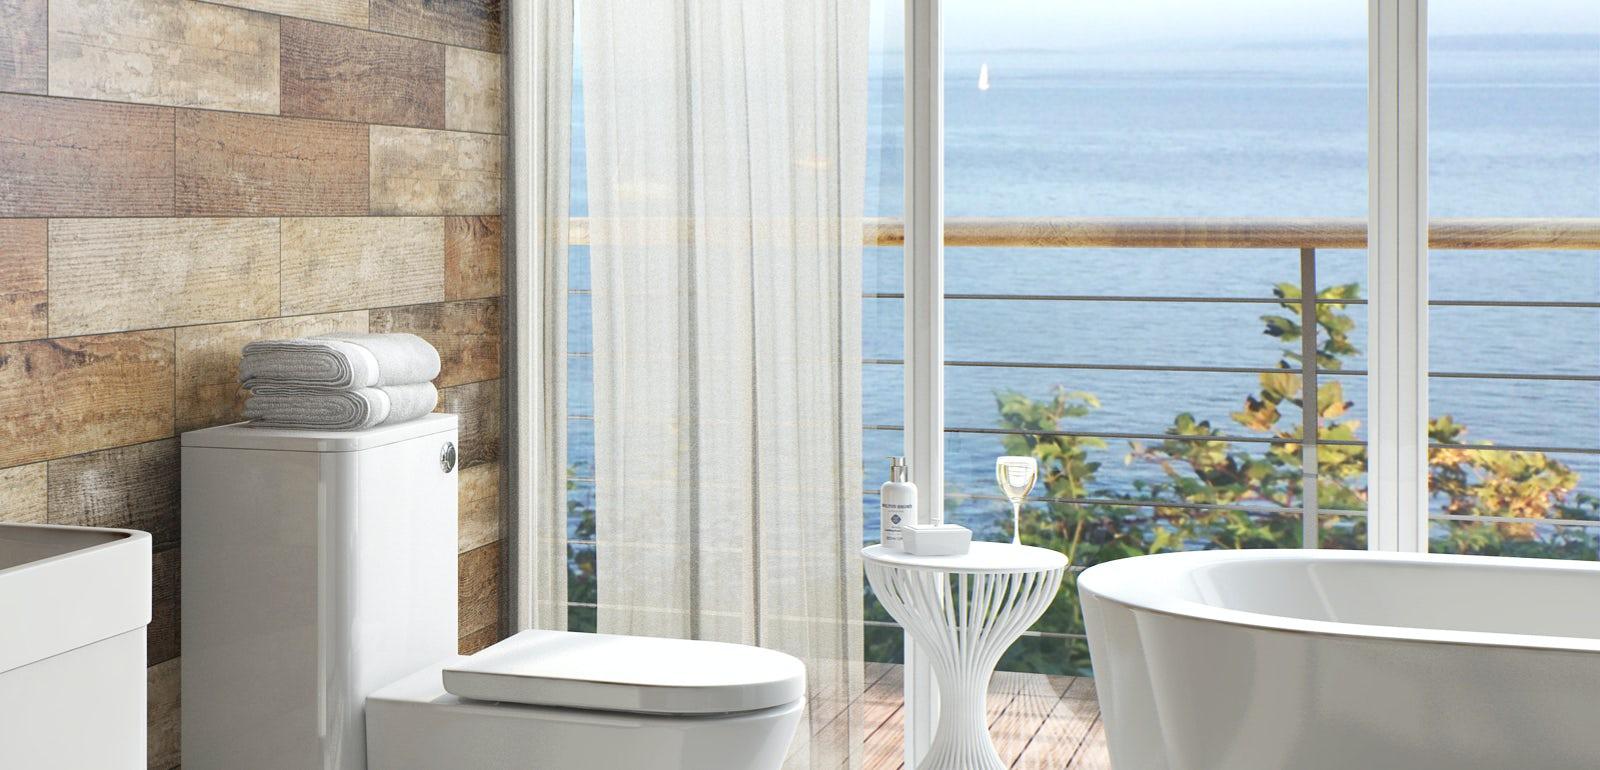 Is your bathroom summer ready?